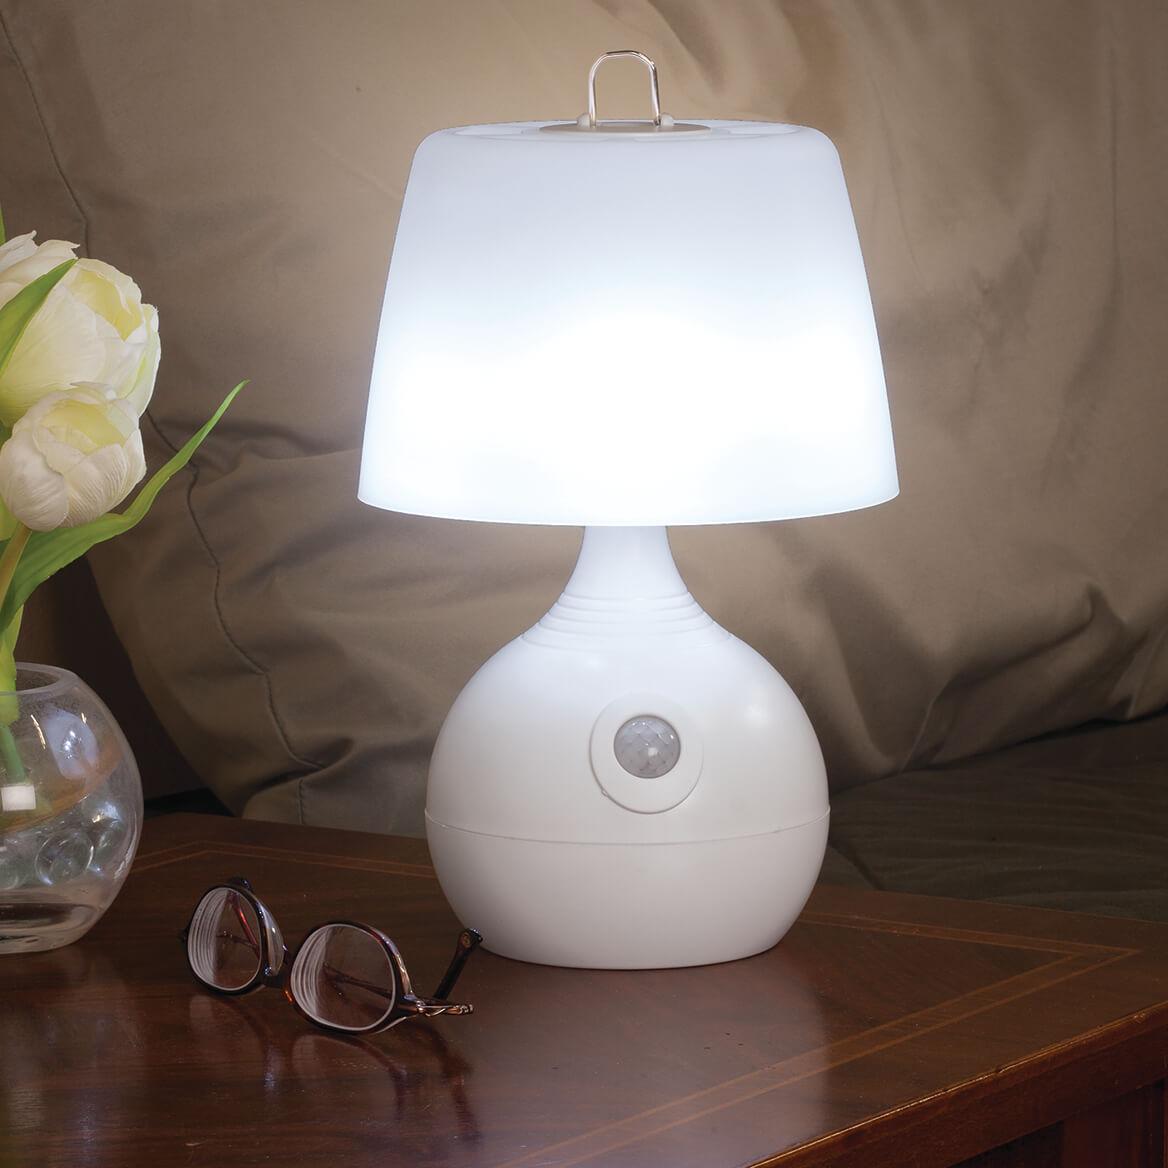 12 LED Motion Sensor Table Lamp-354017